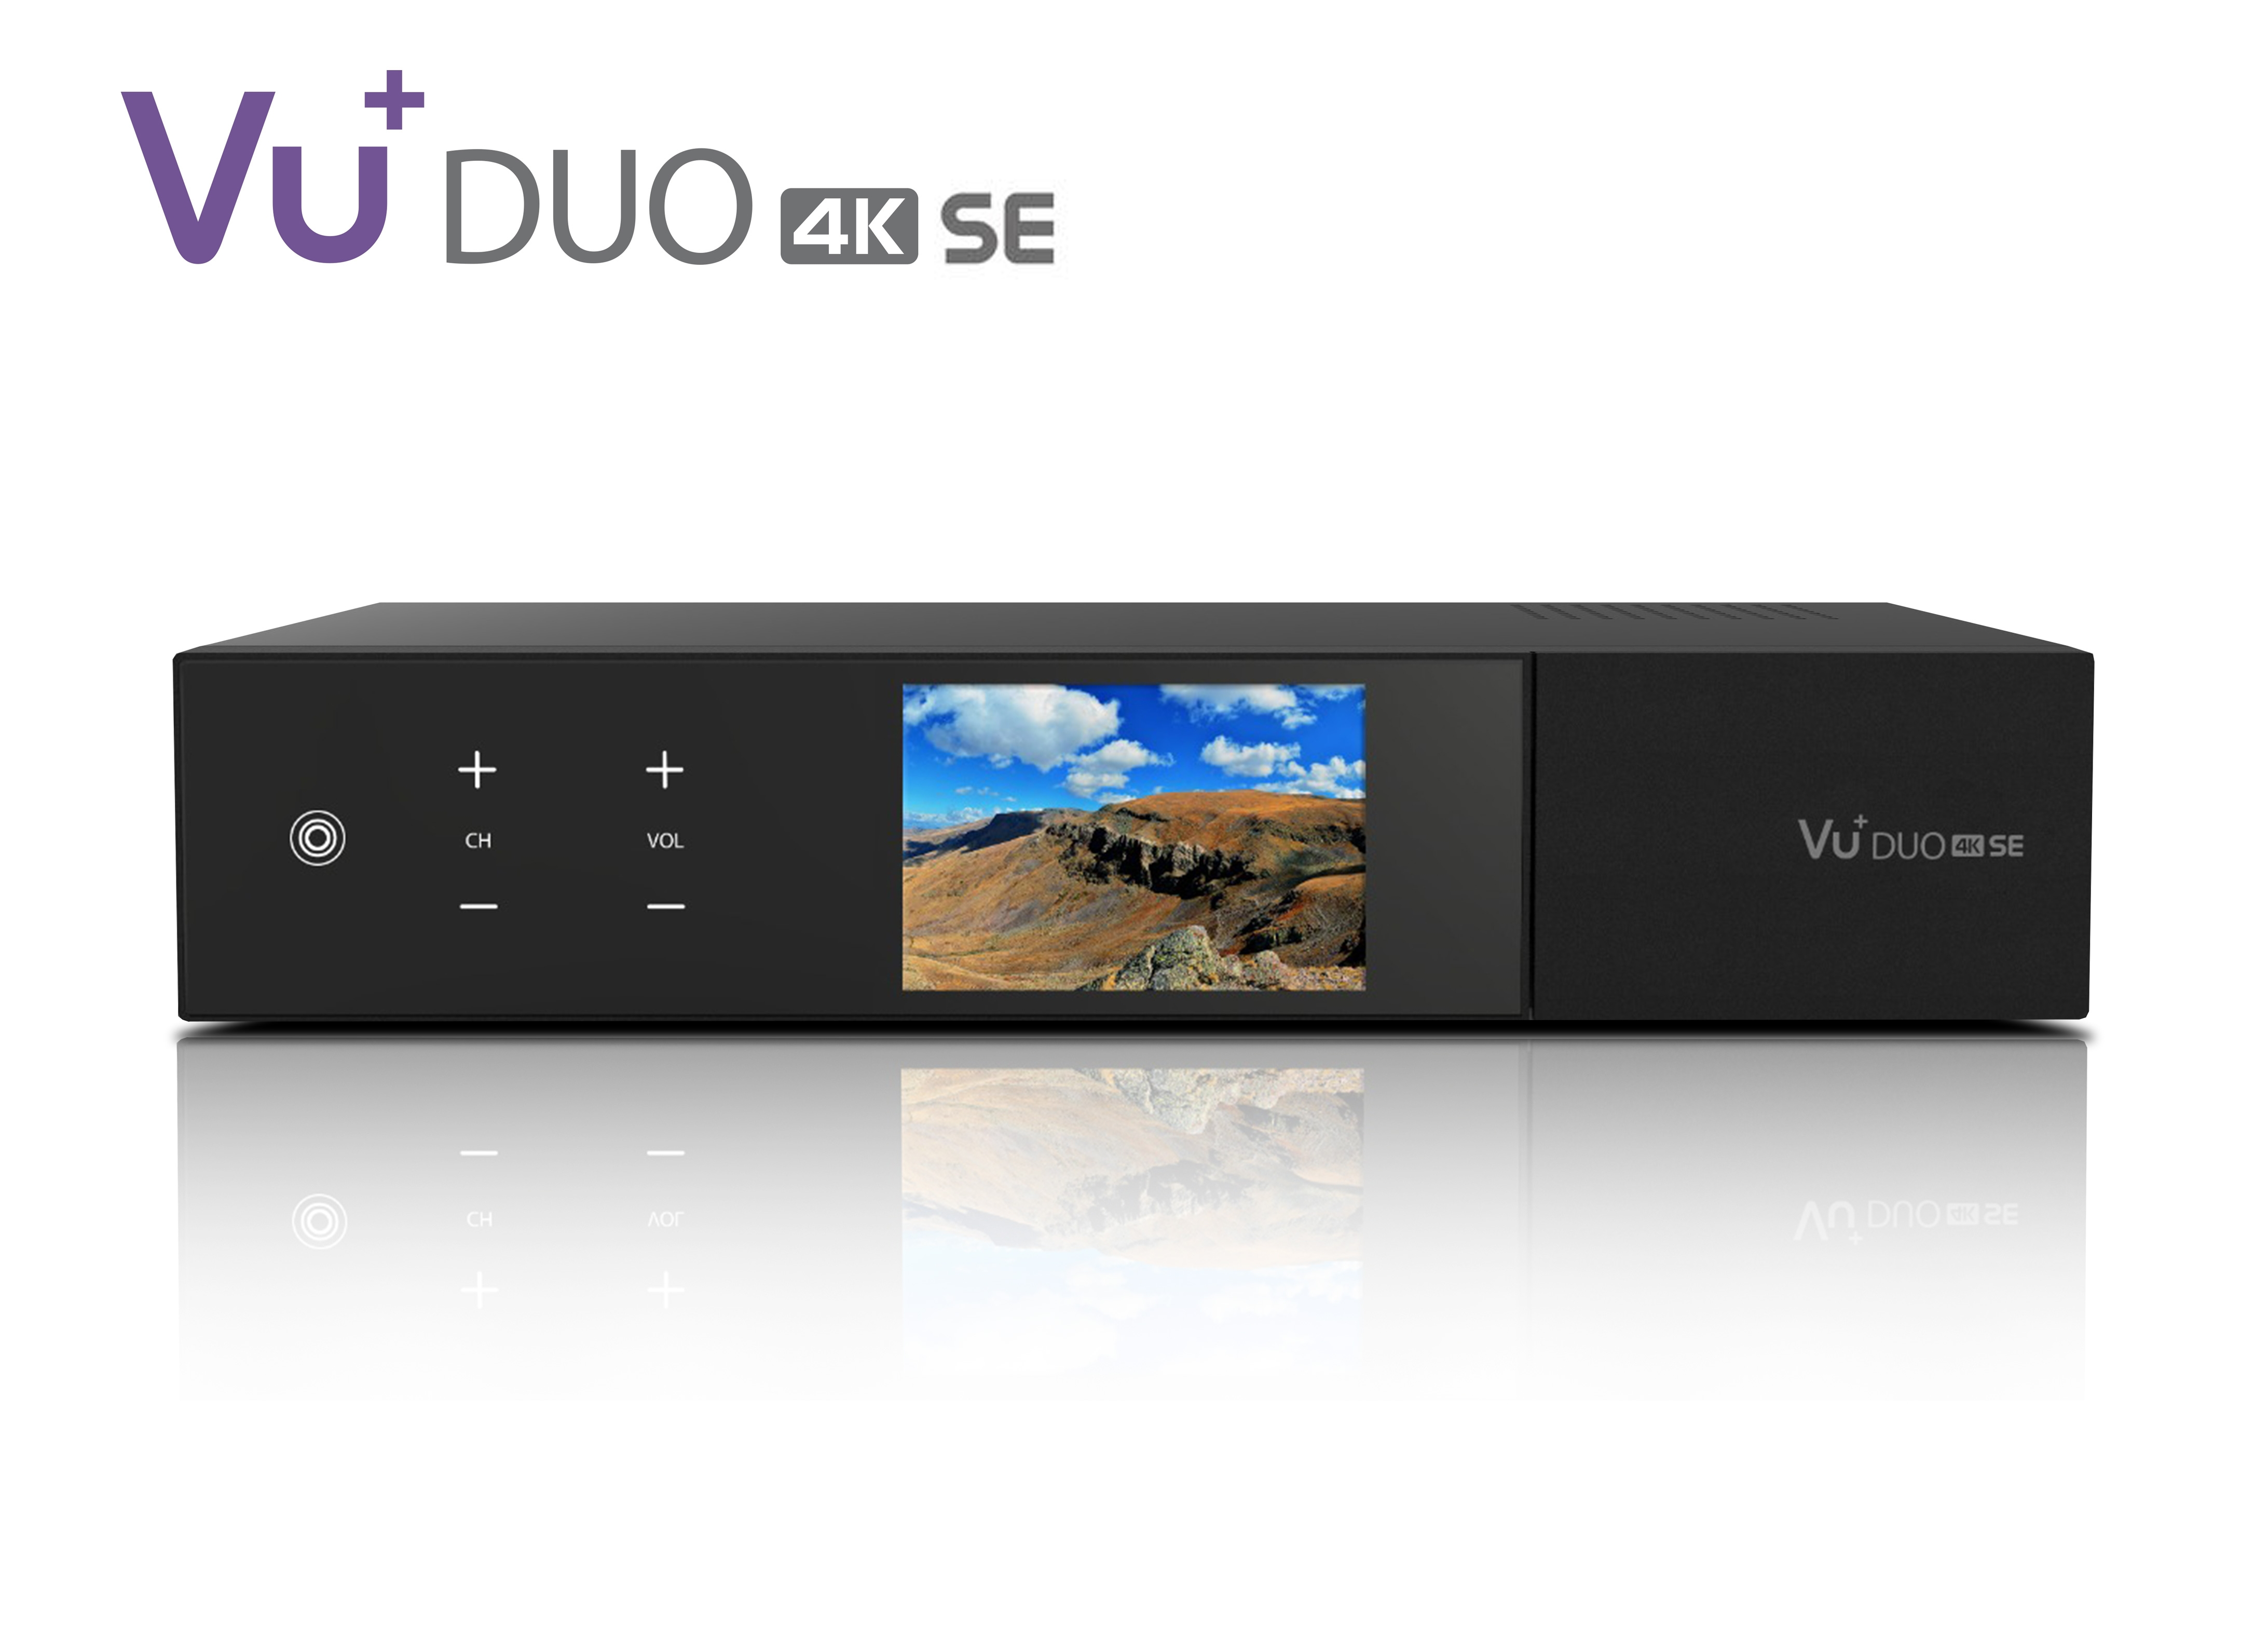 VU+ Duo 4K SE 1x DVB-C FBC Tuner PVR ready Linux Receiver UHD 2160p